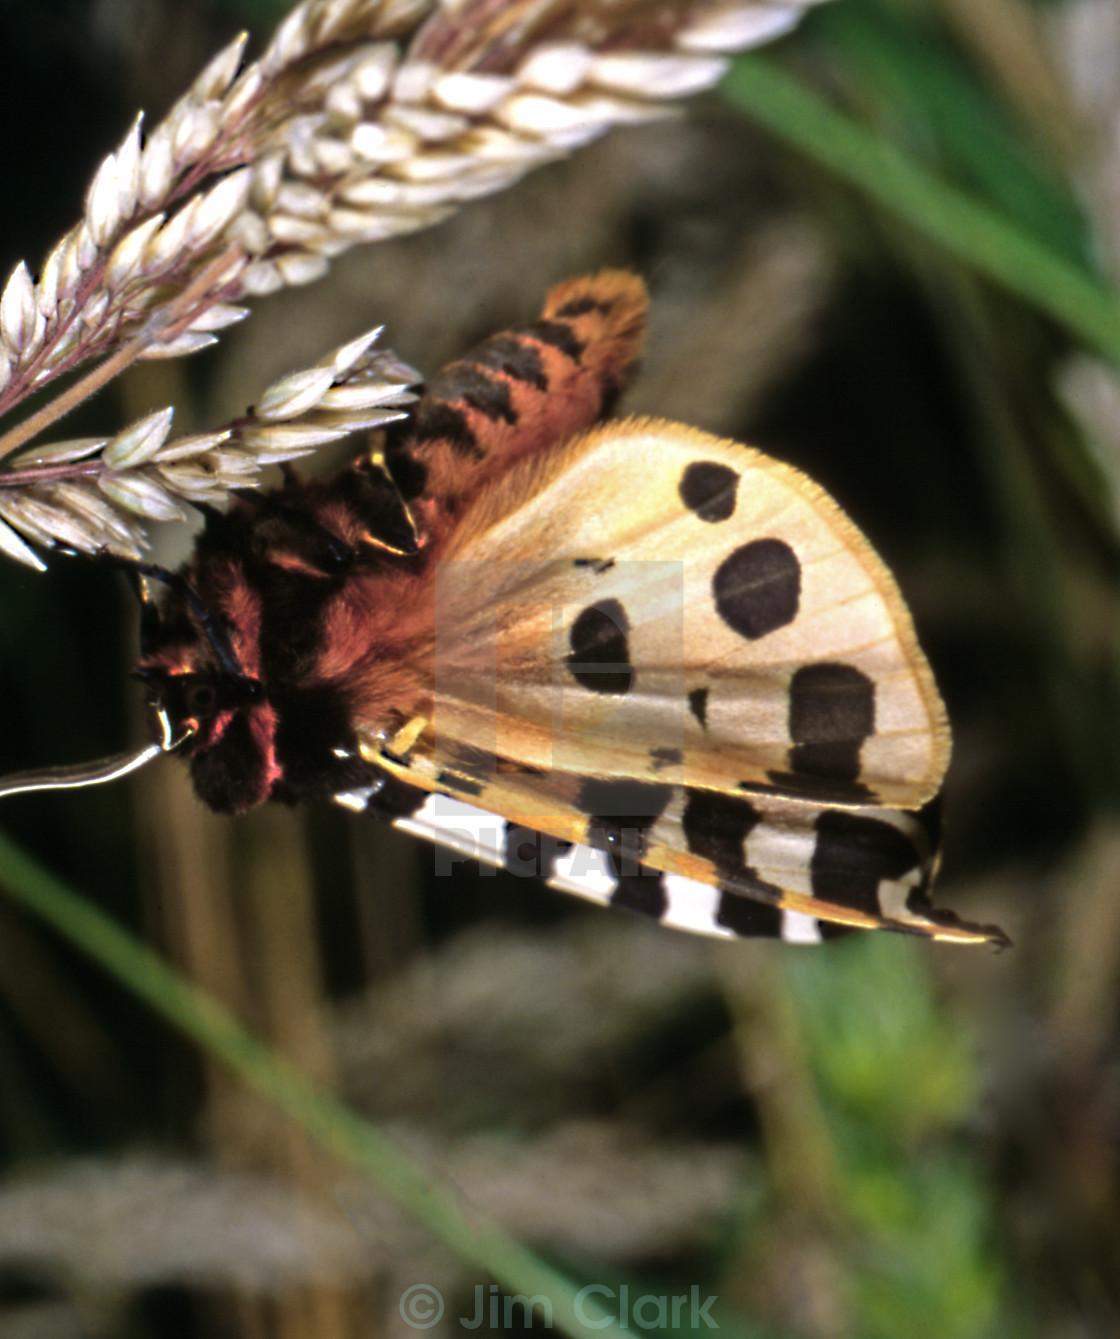 Garden Tiger Moth - License for £6.20 on Picfair